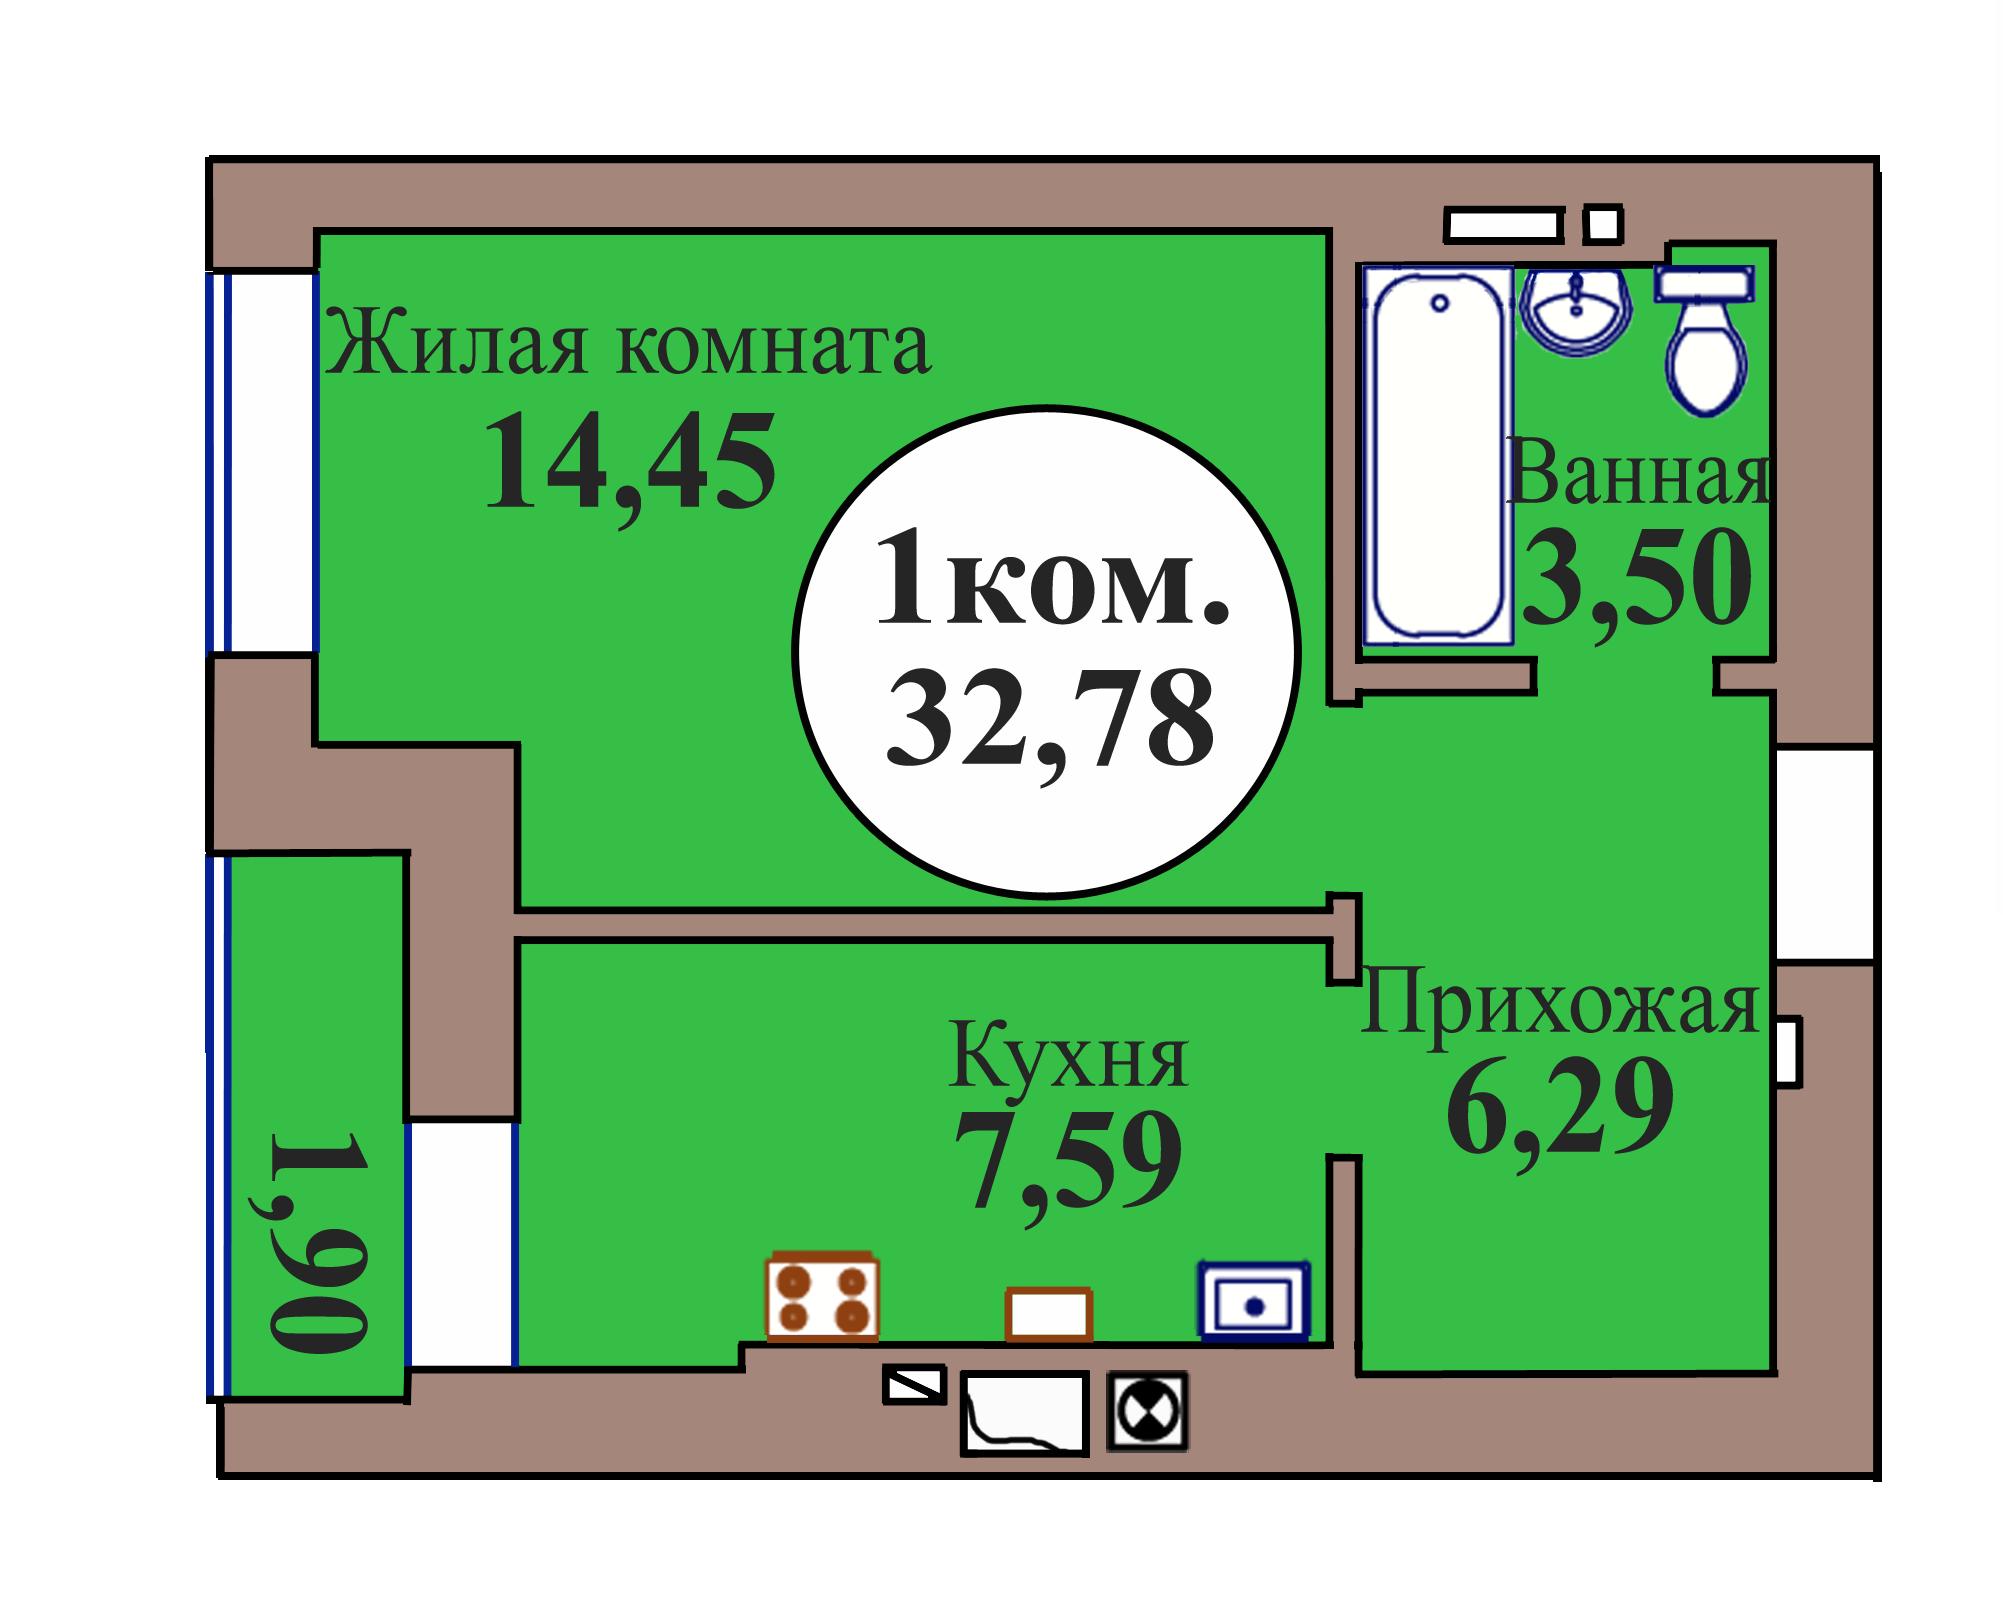 1-комн. кв. по пер. Калининградский, 5 кв. 91 в Калининграде